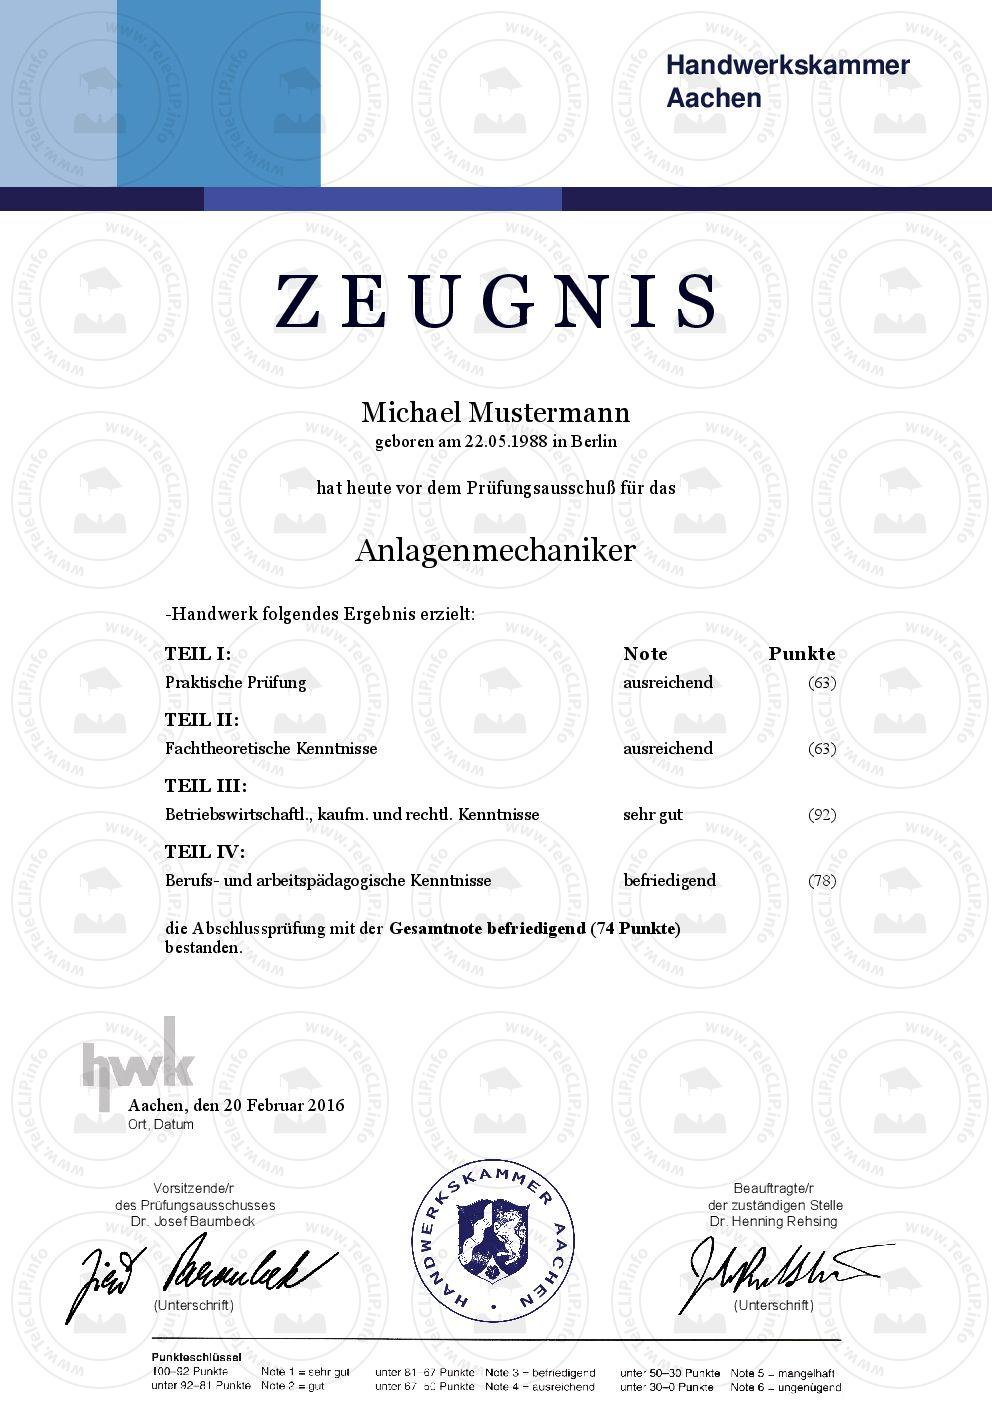 Charmant Homeschool Diplom Vorlage Bilder - Entry Level Resume ...